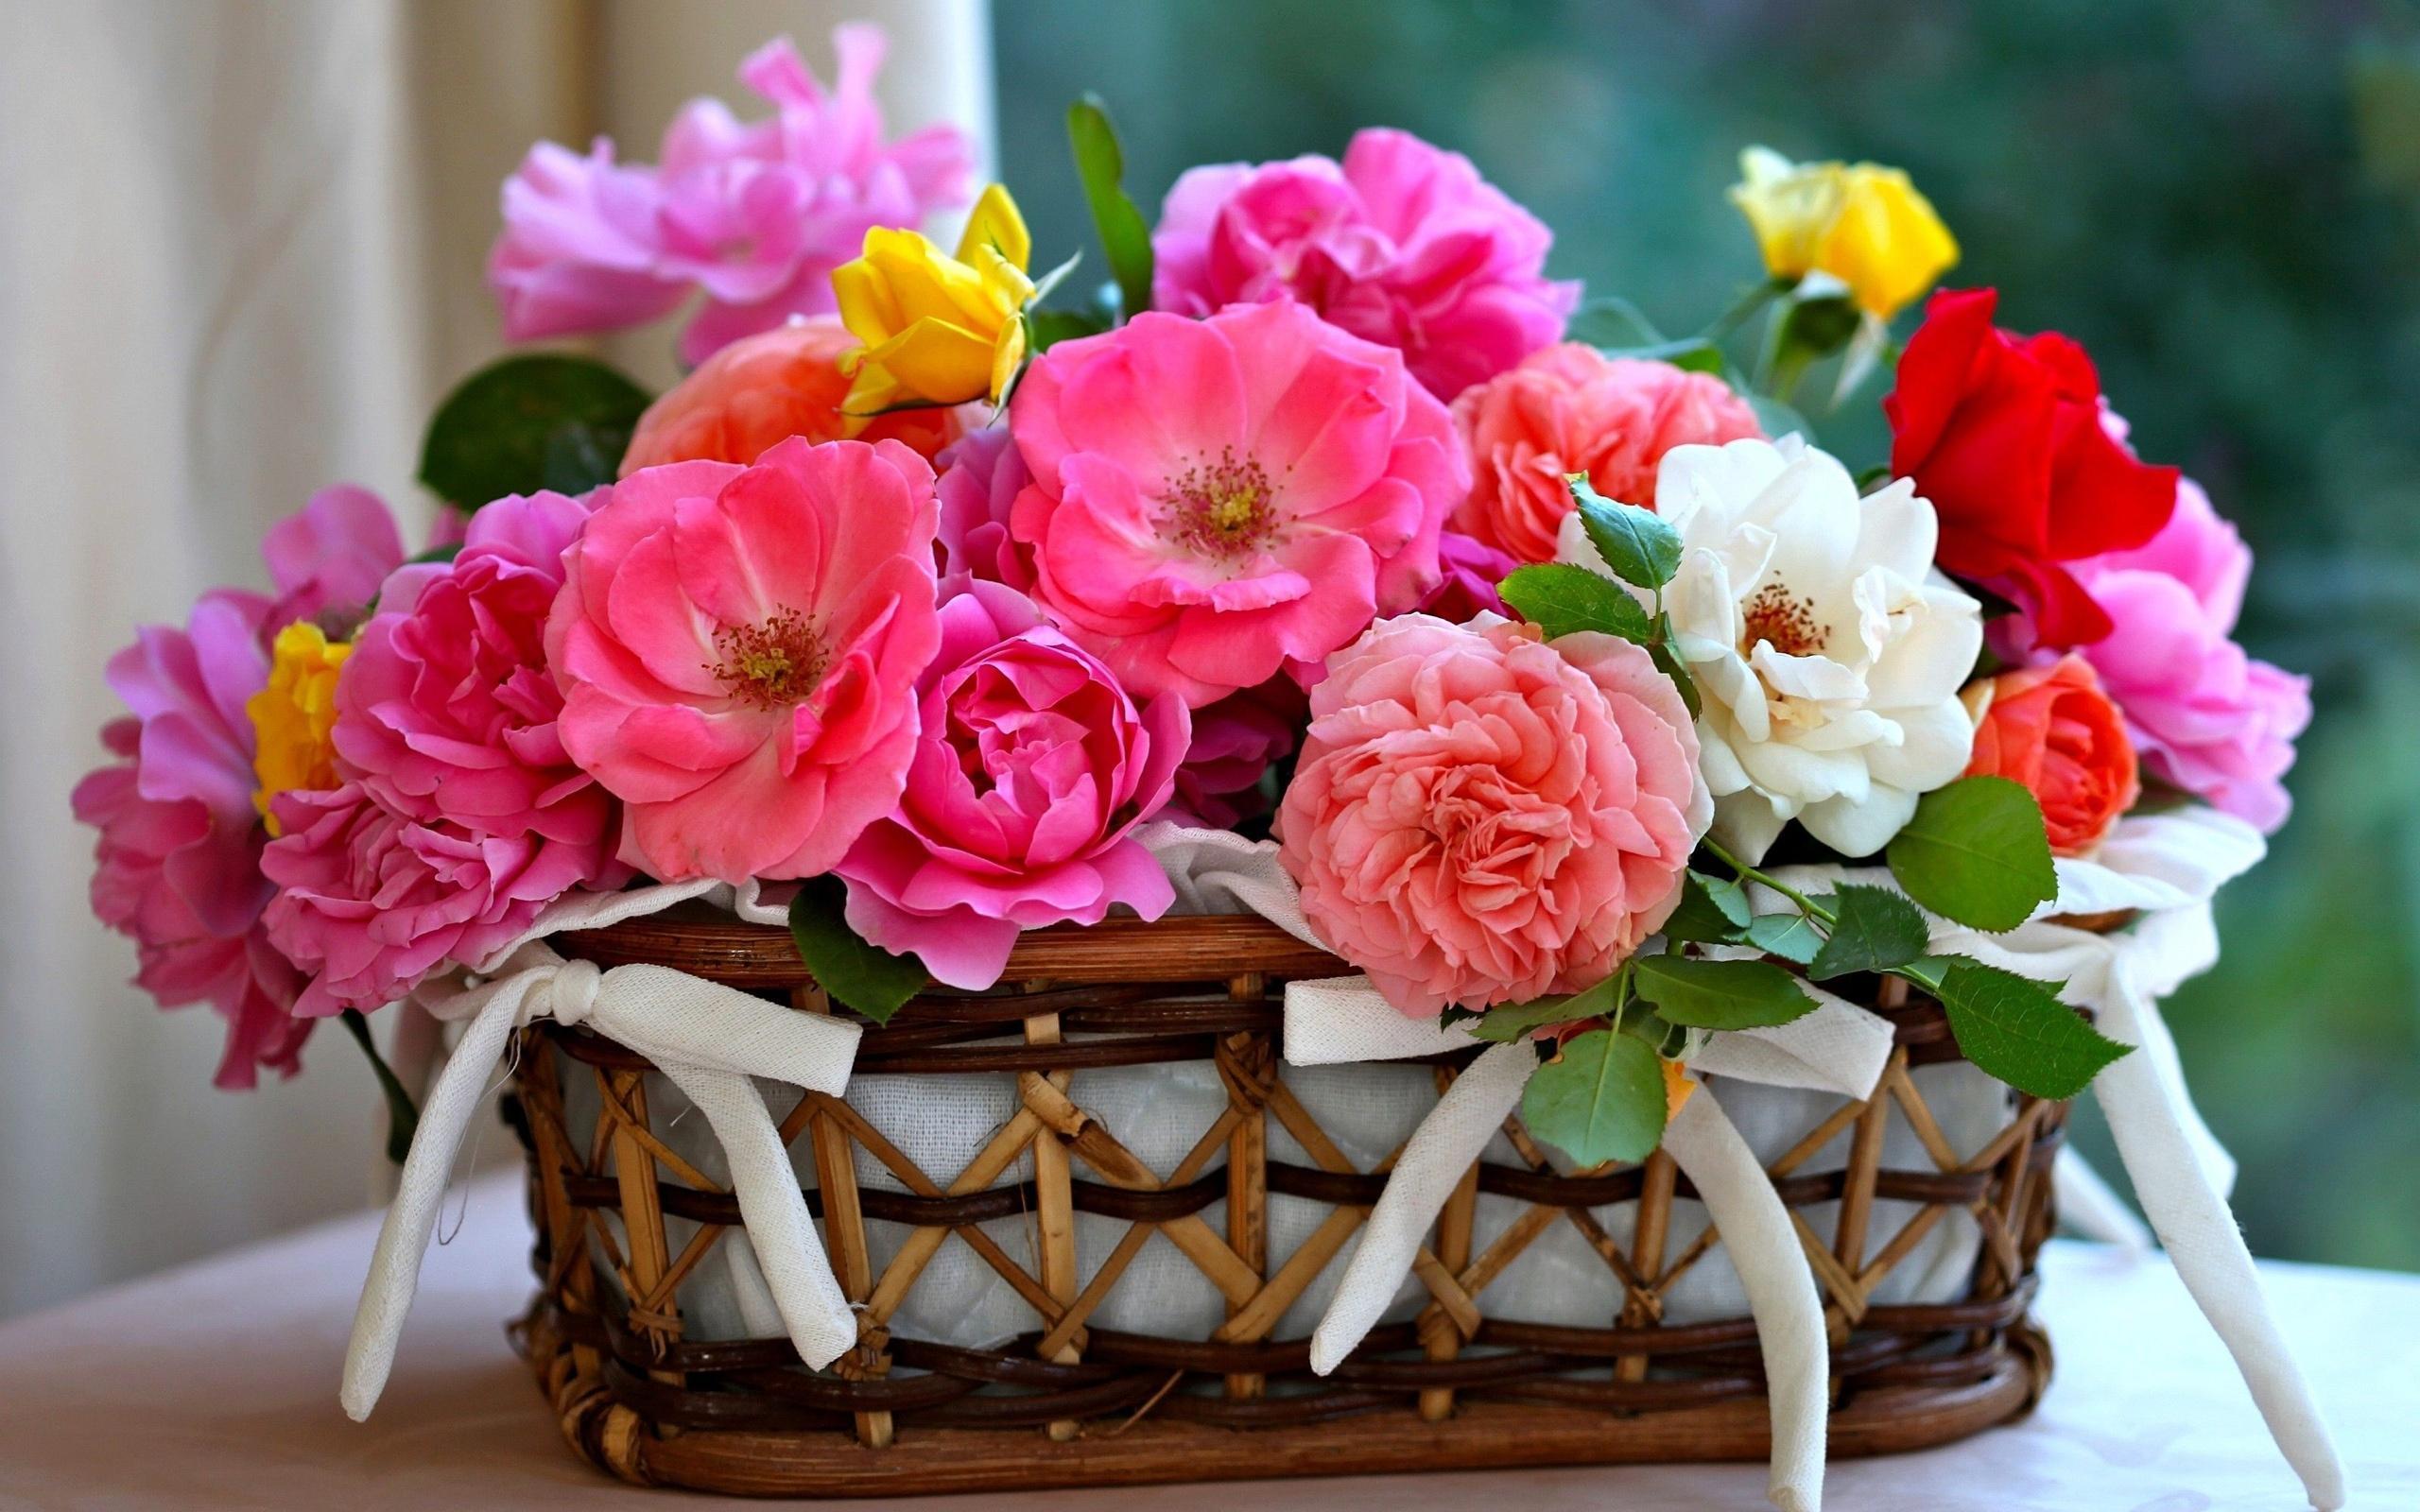 بالصور باقات ورود , اجمل اشكال والوان باقات الورود 6130 8